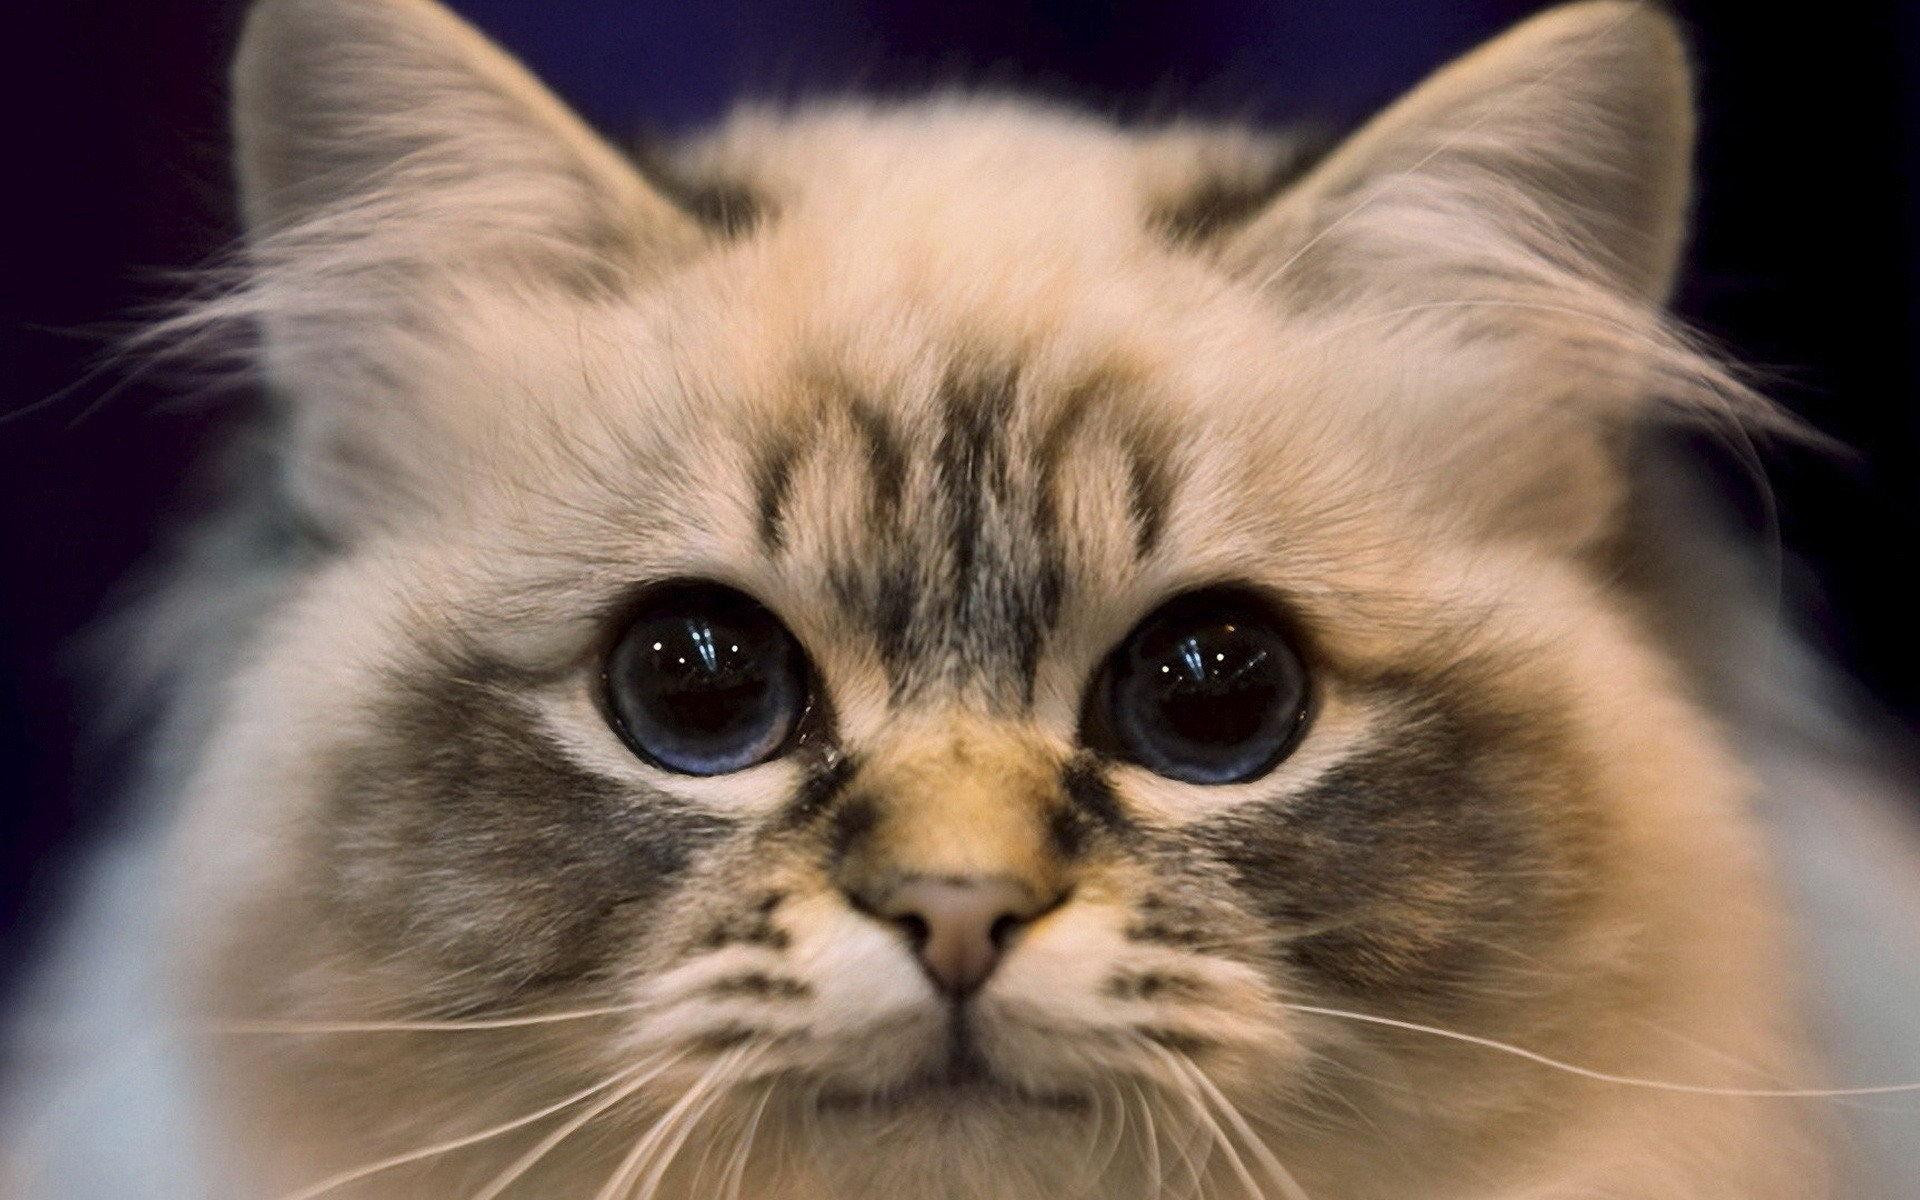 cute-cat-wallpaper-hd-picture-4886-wallpaper-hd-wallpaper-cute-animal-images-cute-cat-wallpapers